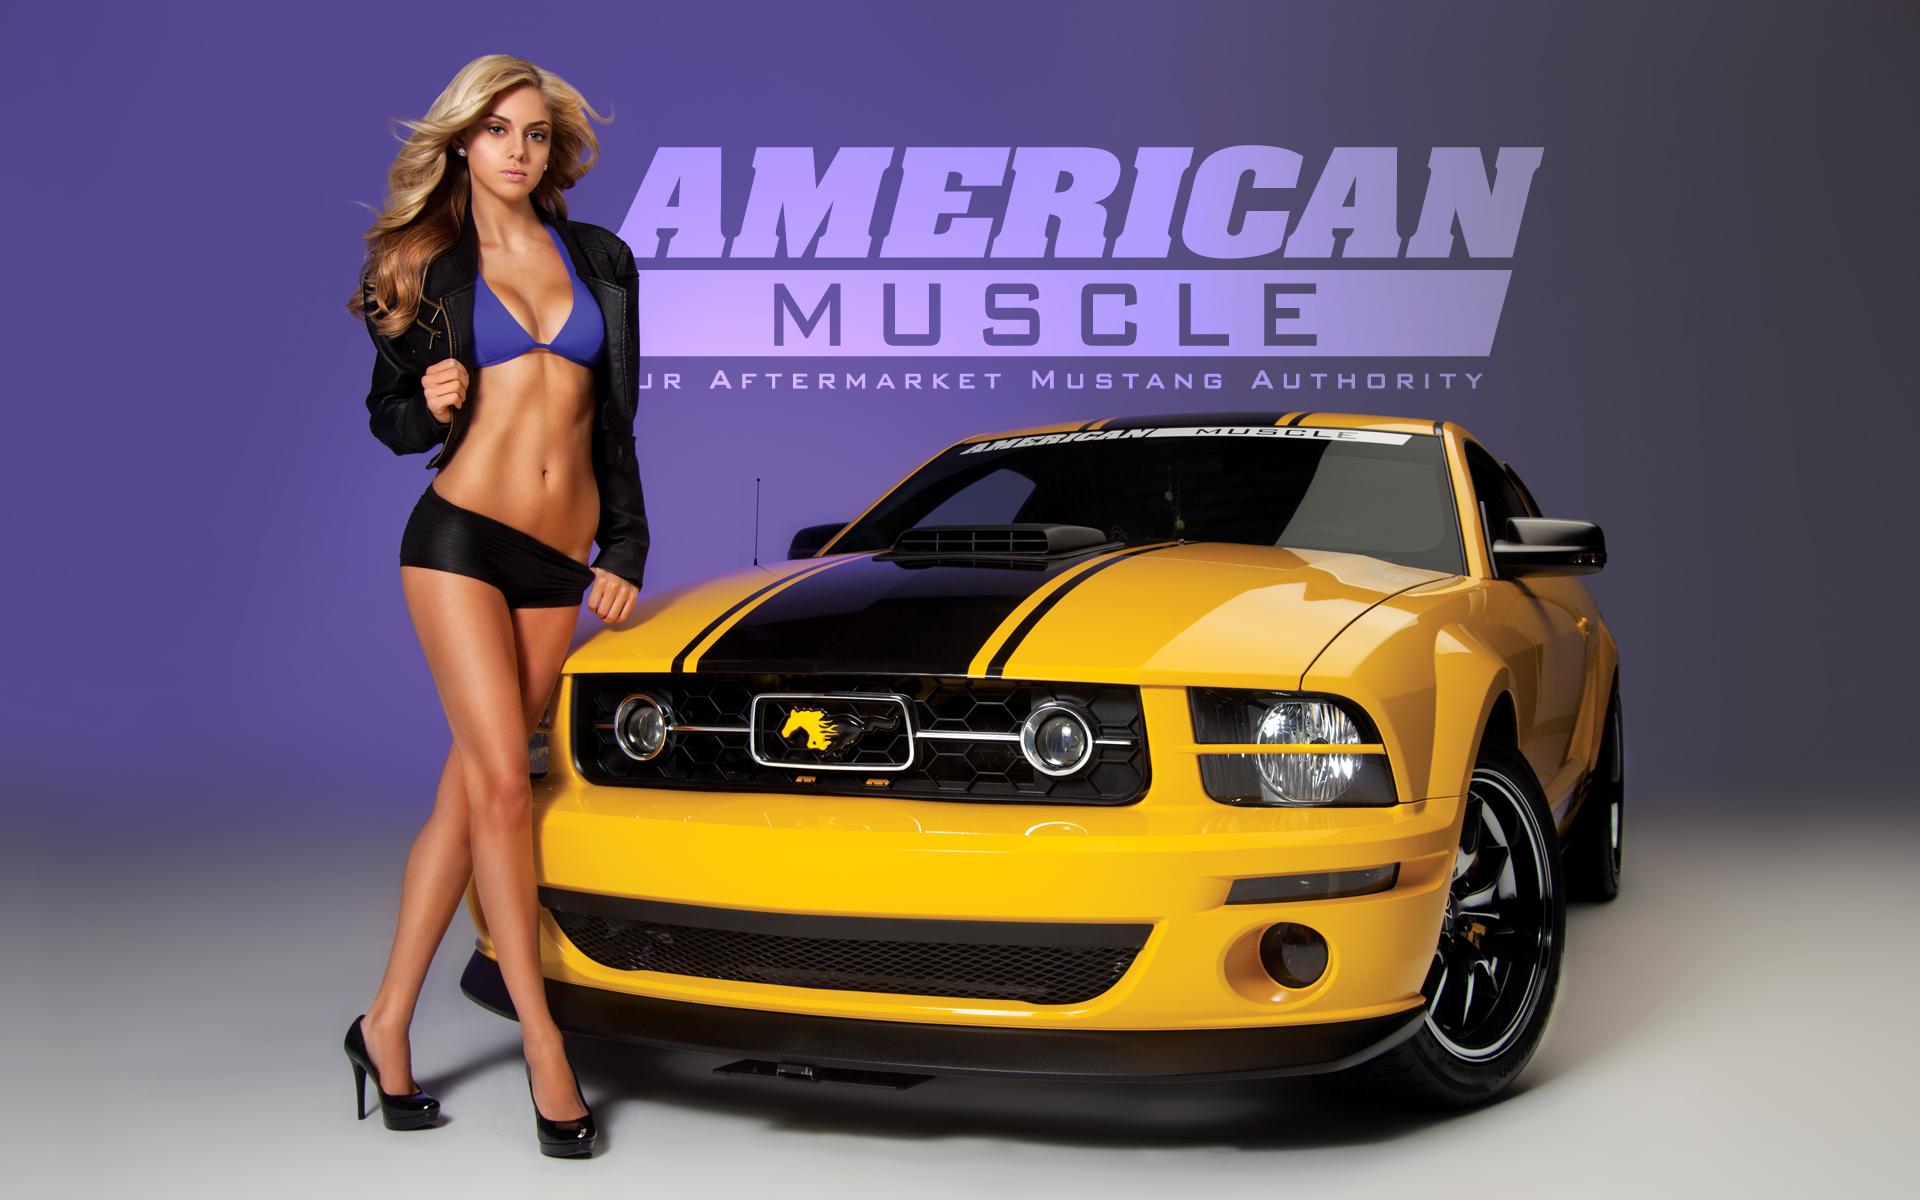 american muscle calendar girls Car Tuning